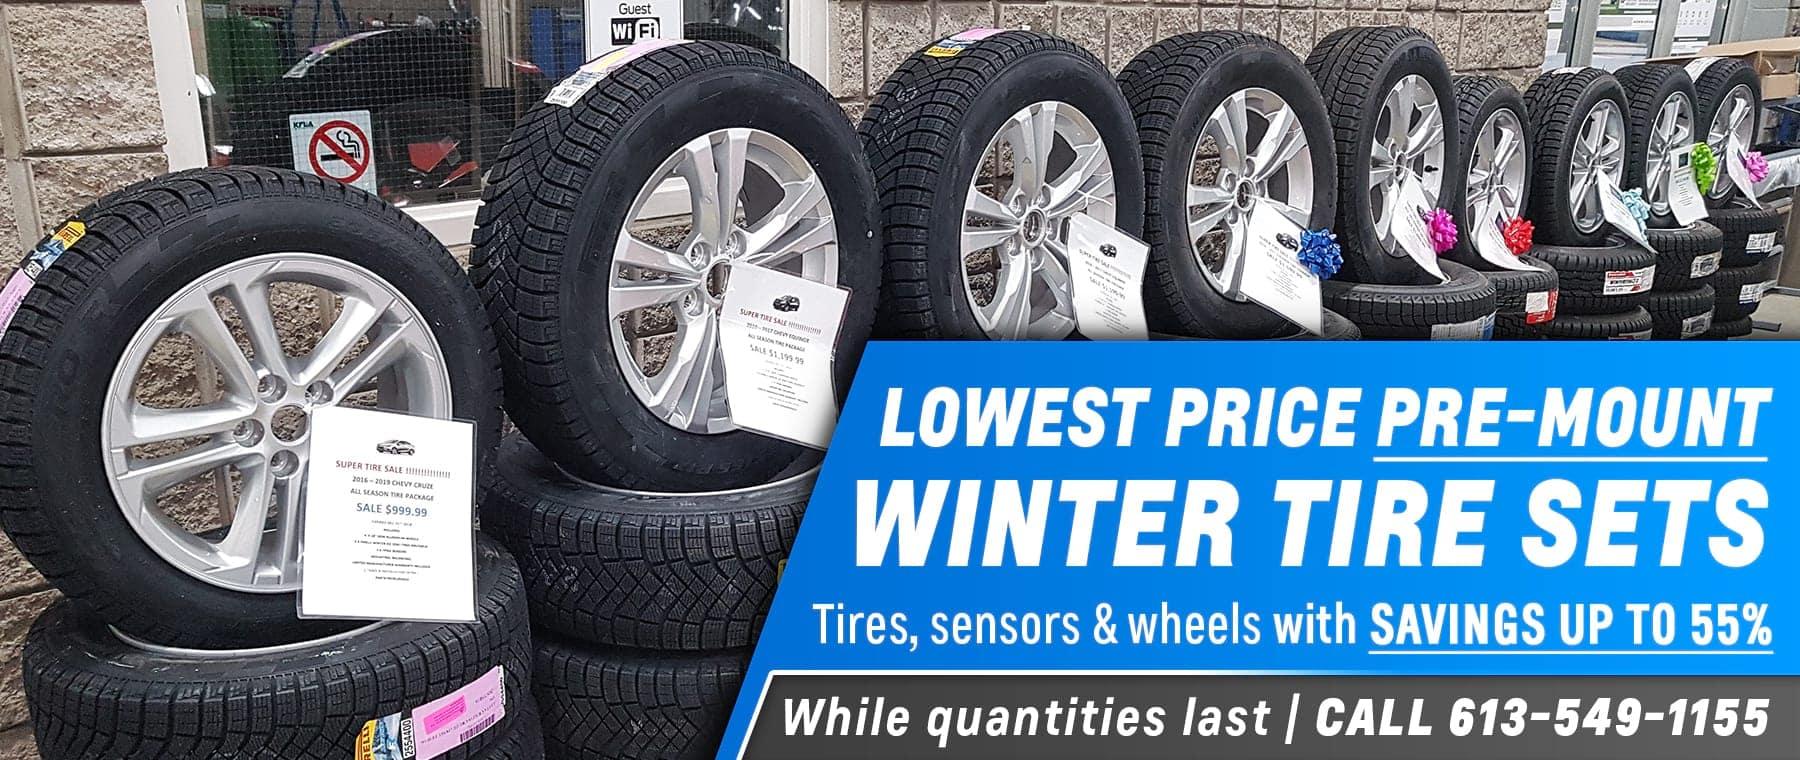 winter tire premount sets